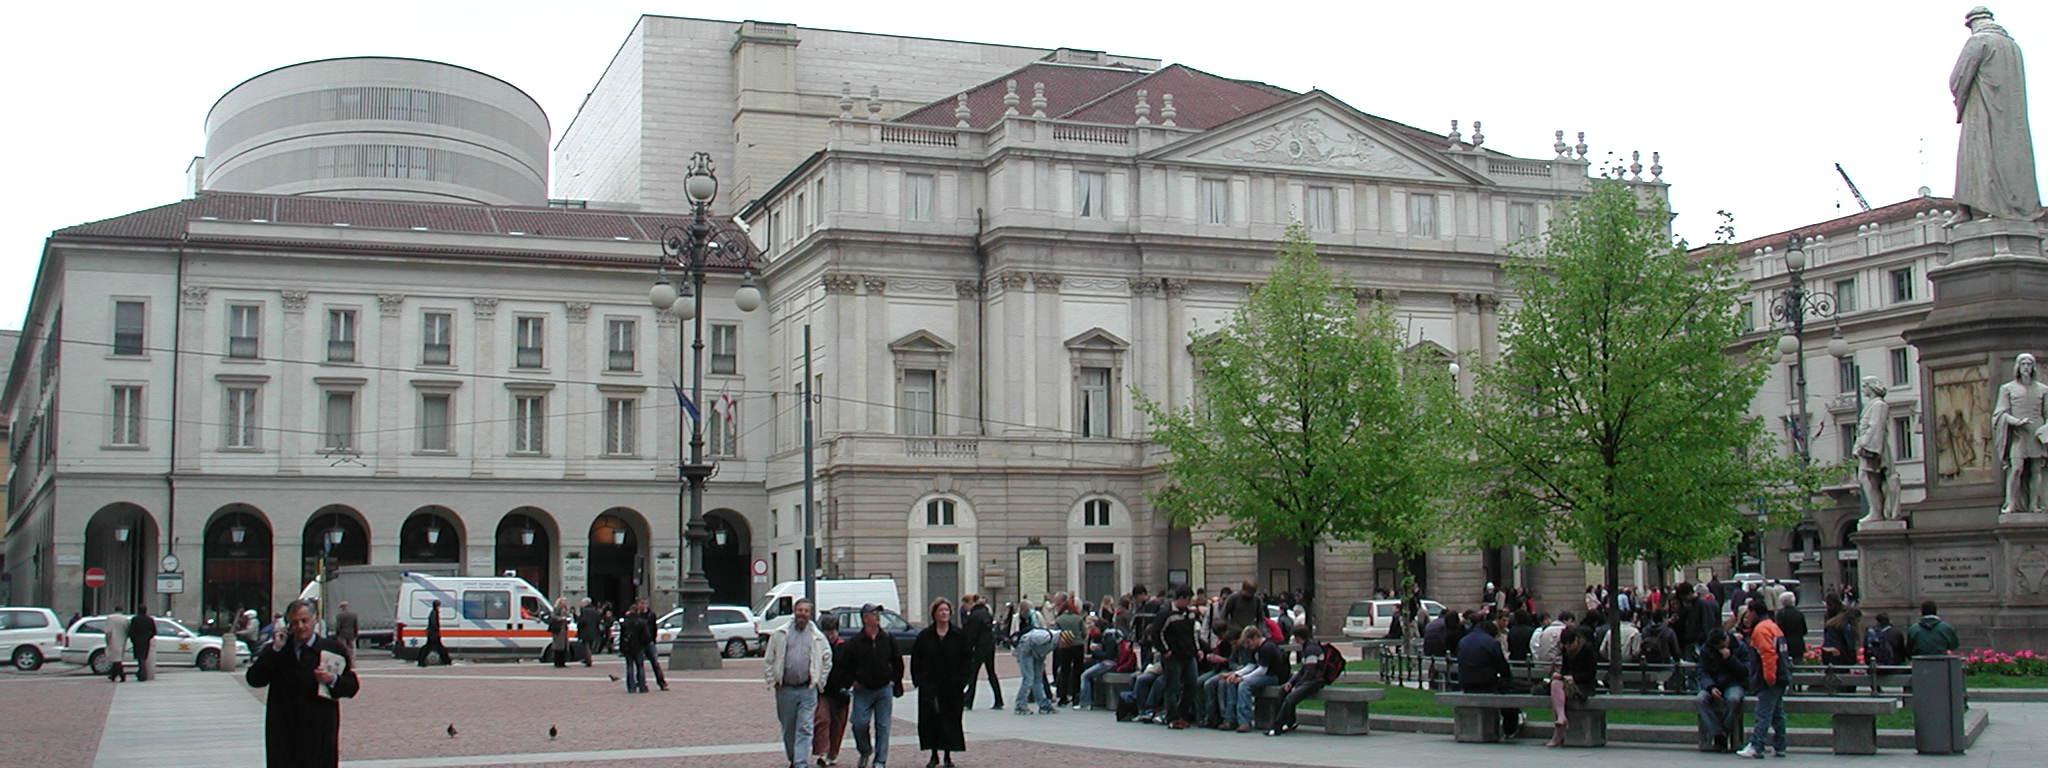 Major renovation, 2002 to 2004[edit]